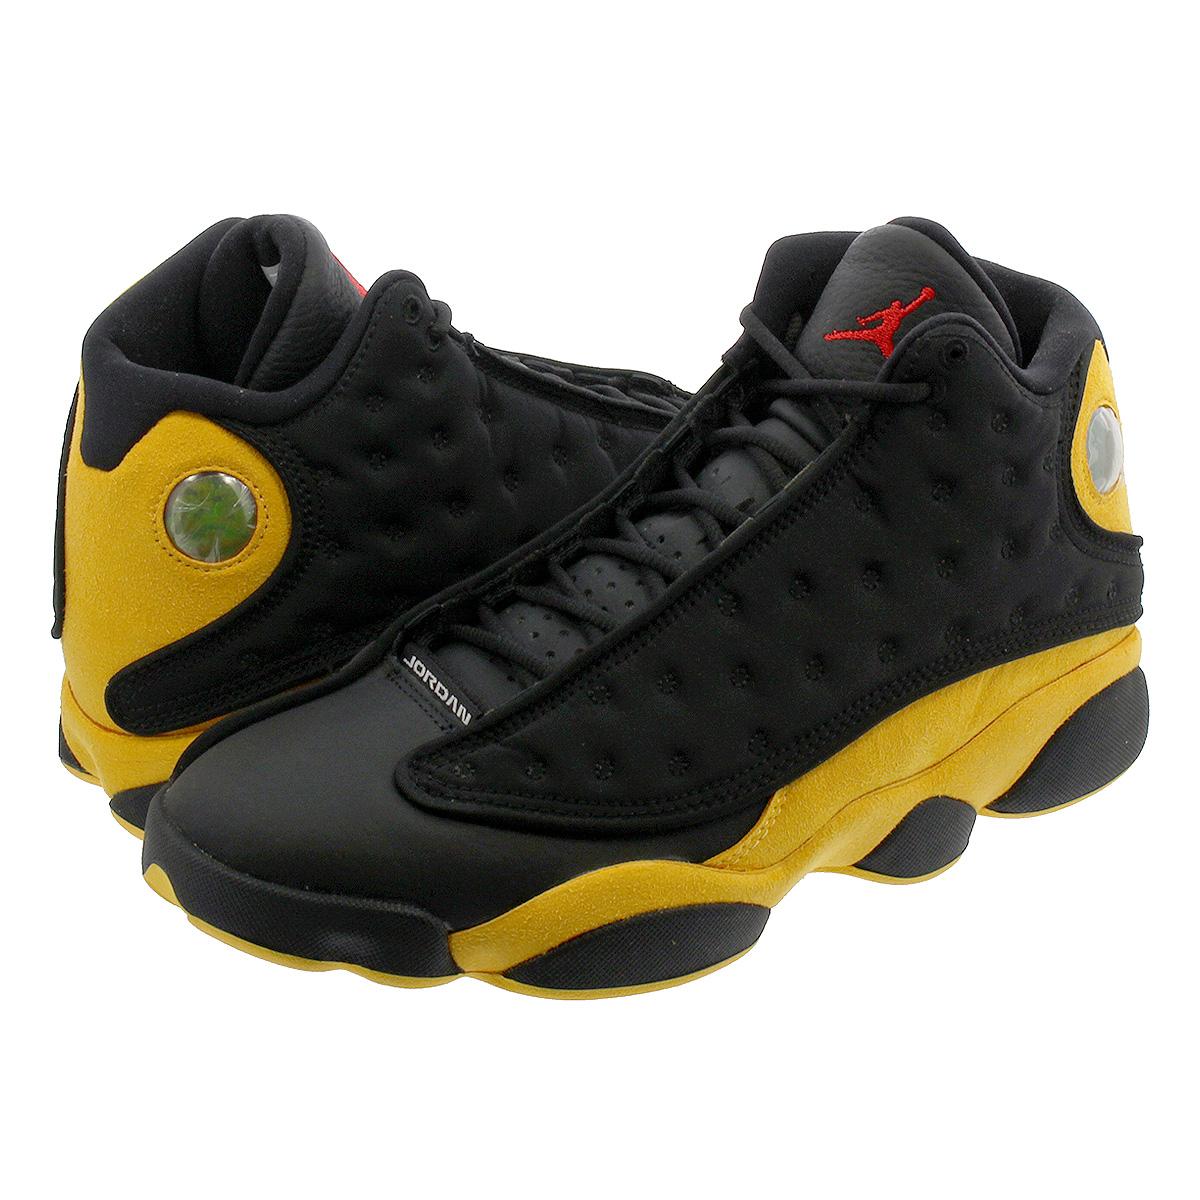 brand new 90f95 458bf NIKE AIR JORDAN 13 RETRO Nike Air Jordan 13 nostalgic BLACK/UNIVERSITY  RED/UNIVERSITY GOLD 414,571-035